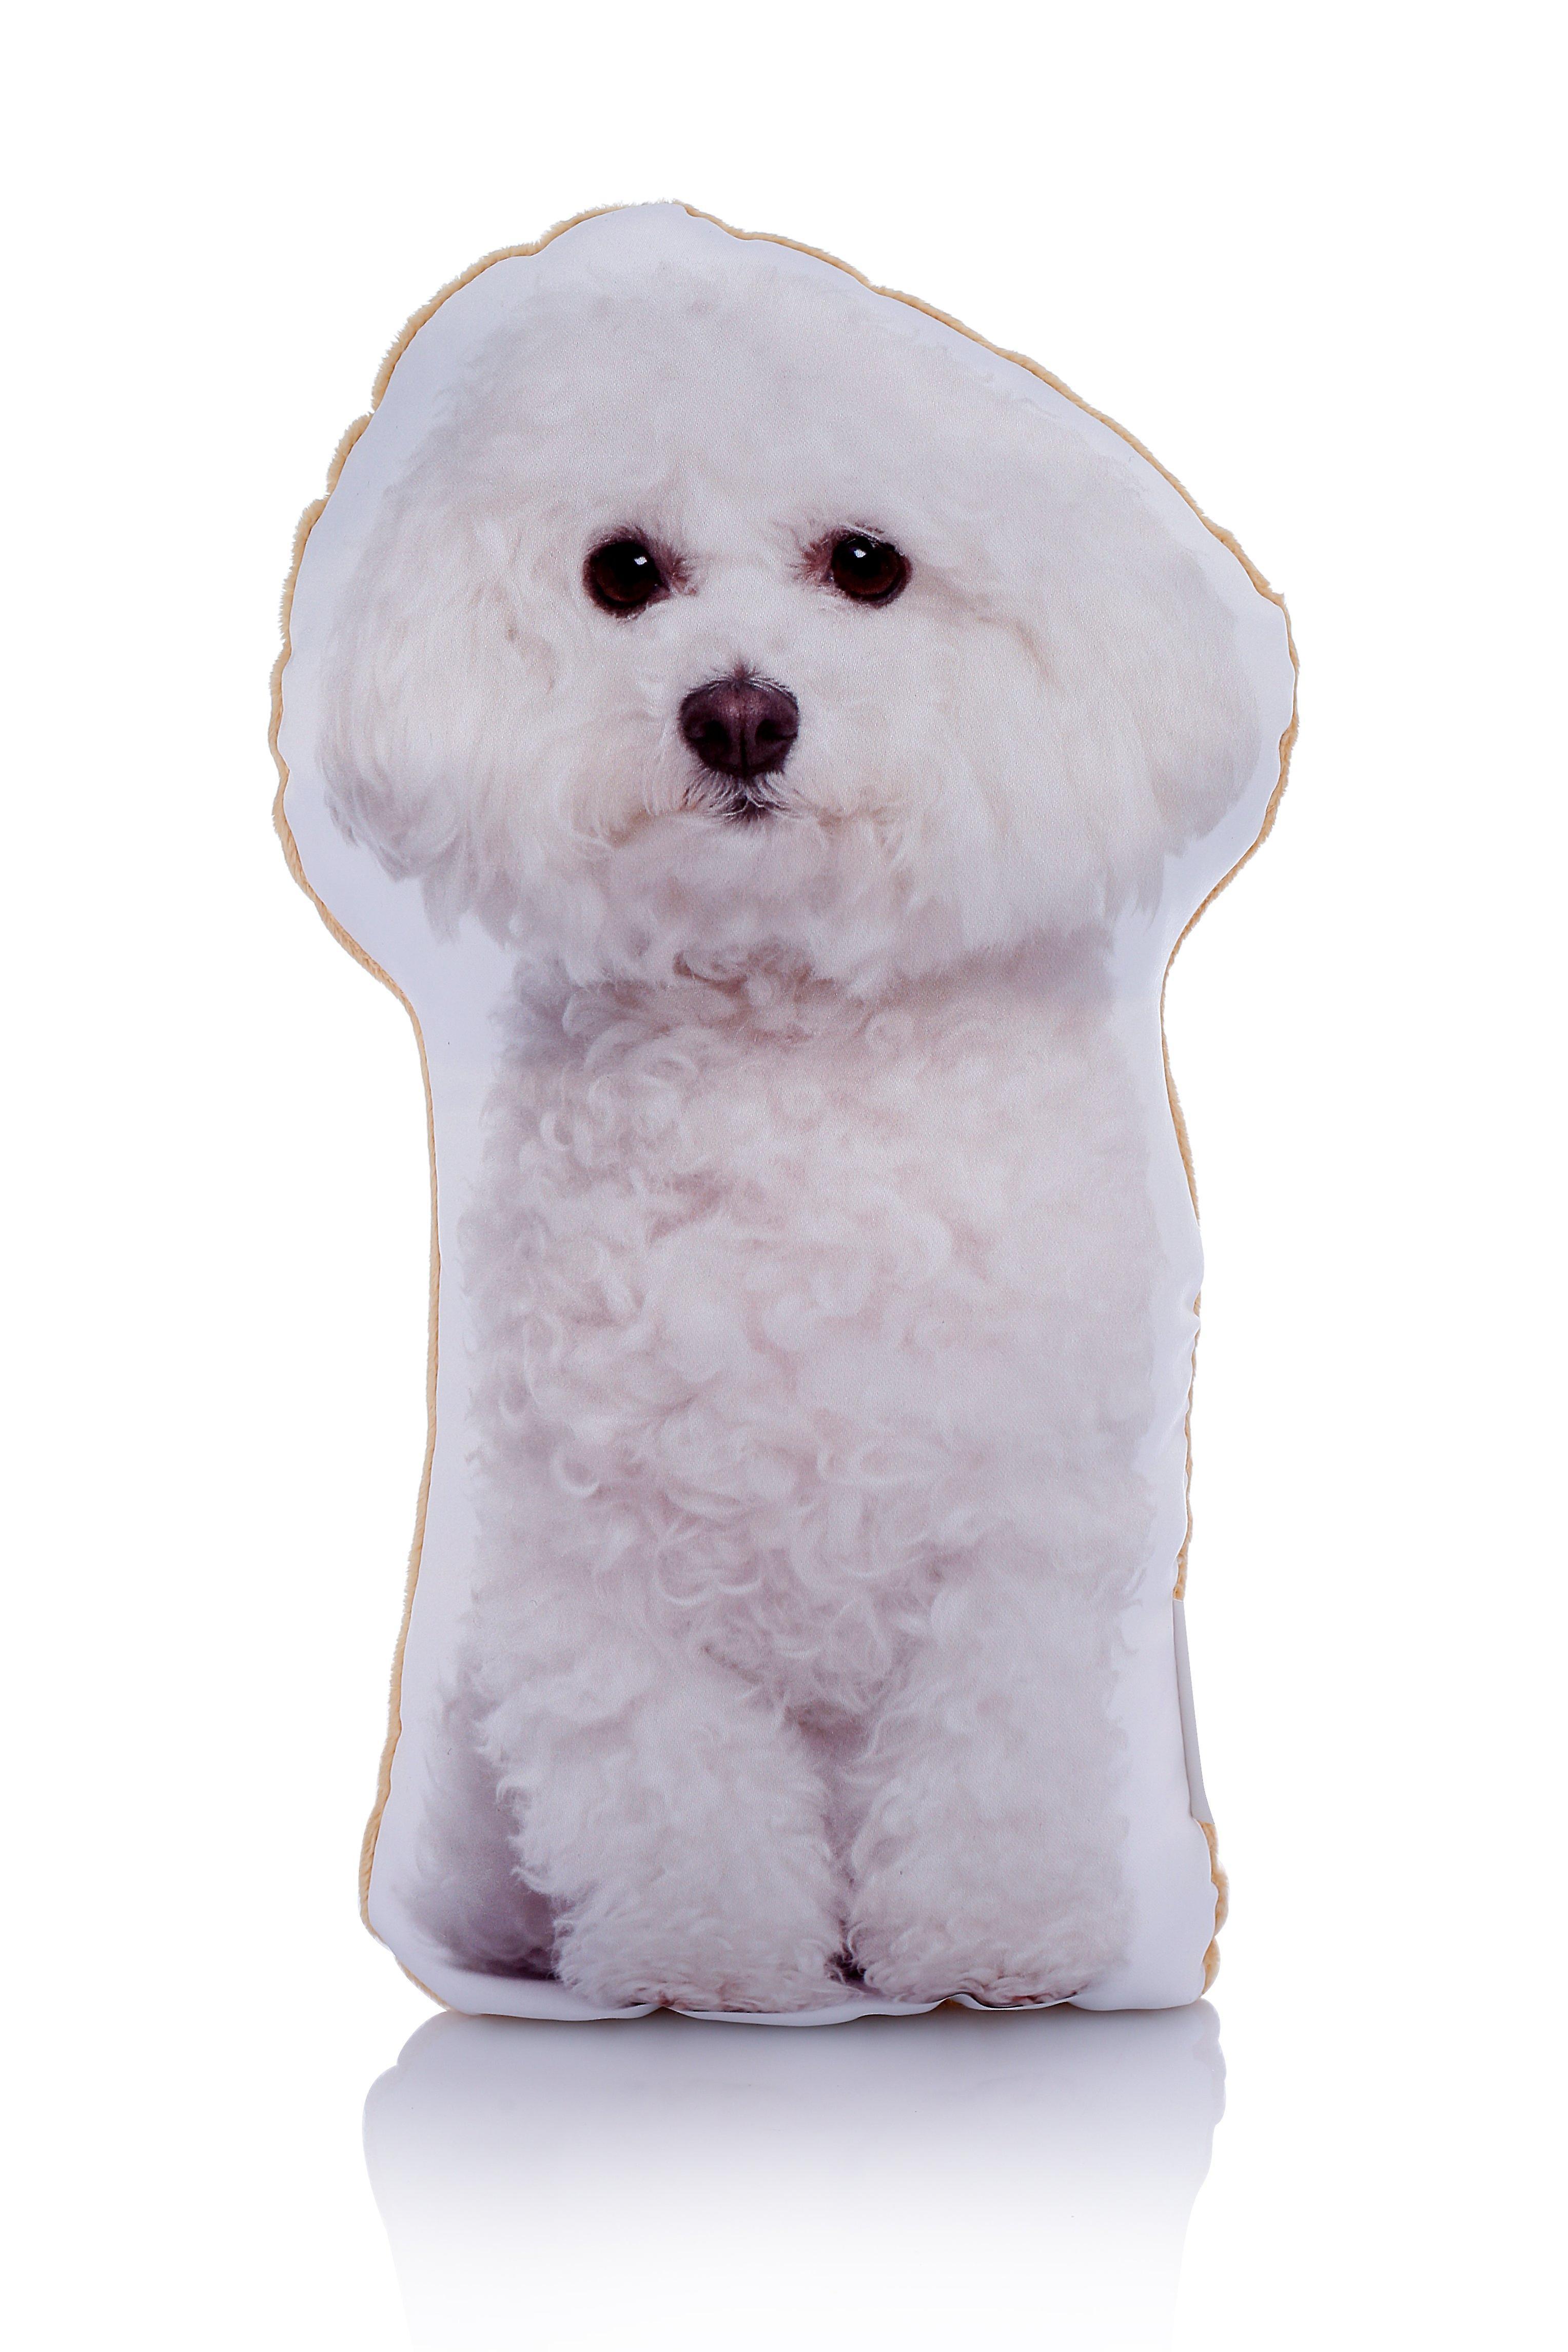 Adorable bichon frise shaped midi cushion